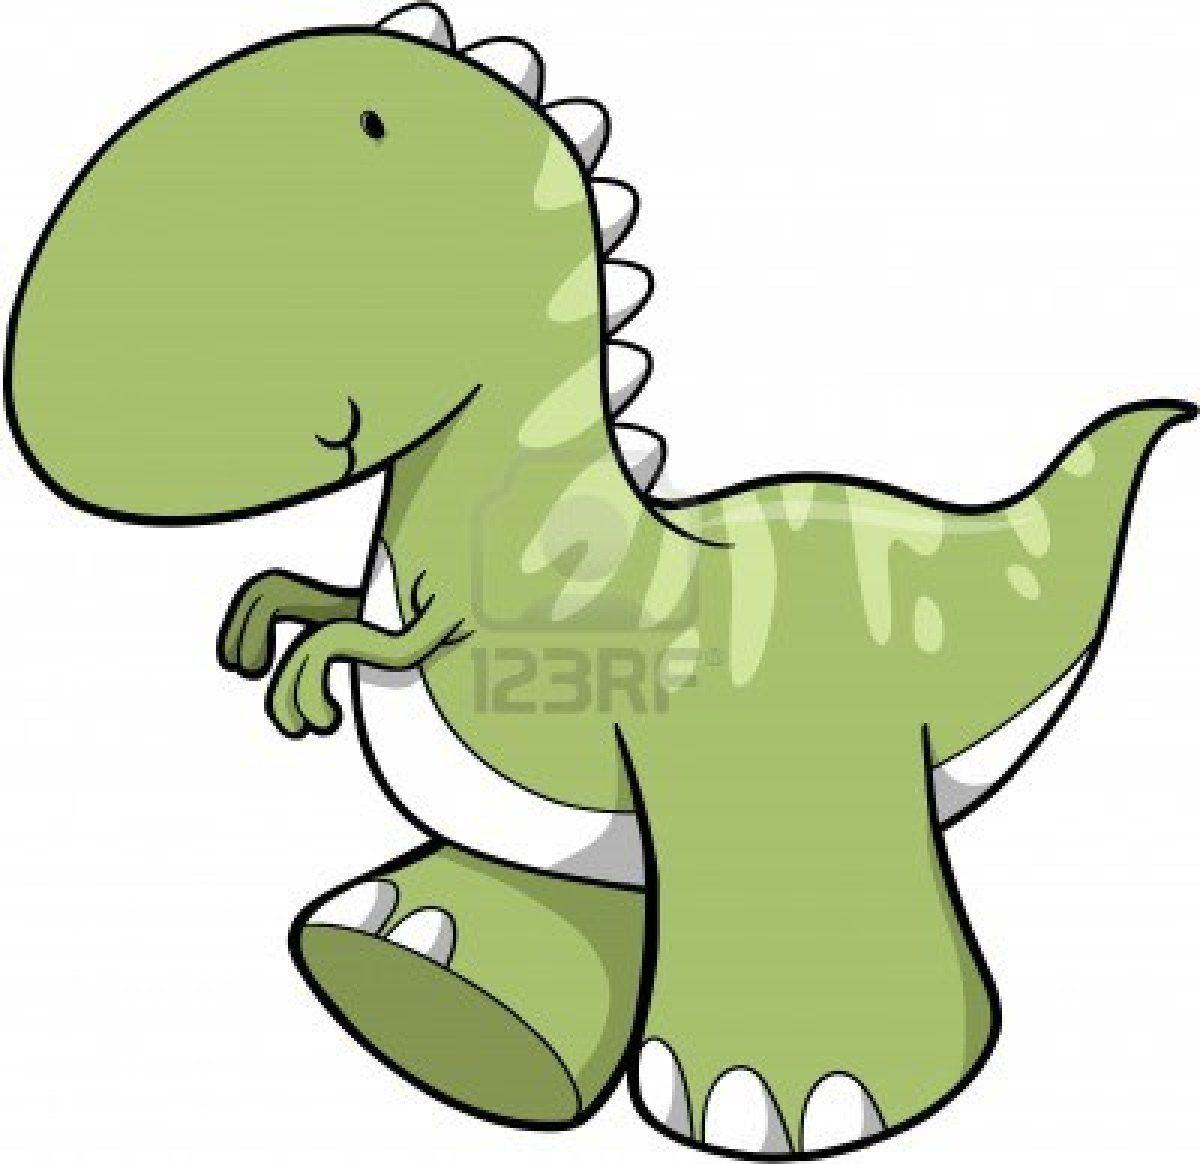 dinosaur - Google Search | Random DIY Projects | Pinterest | Dibujo